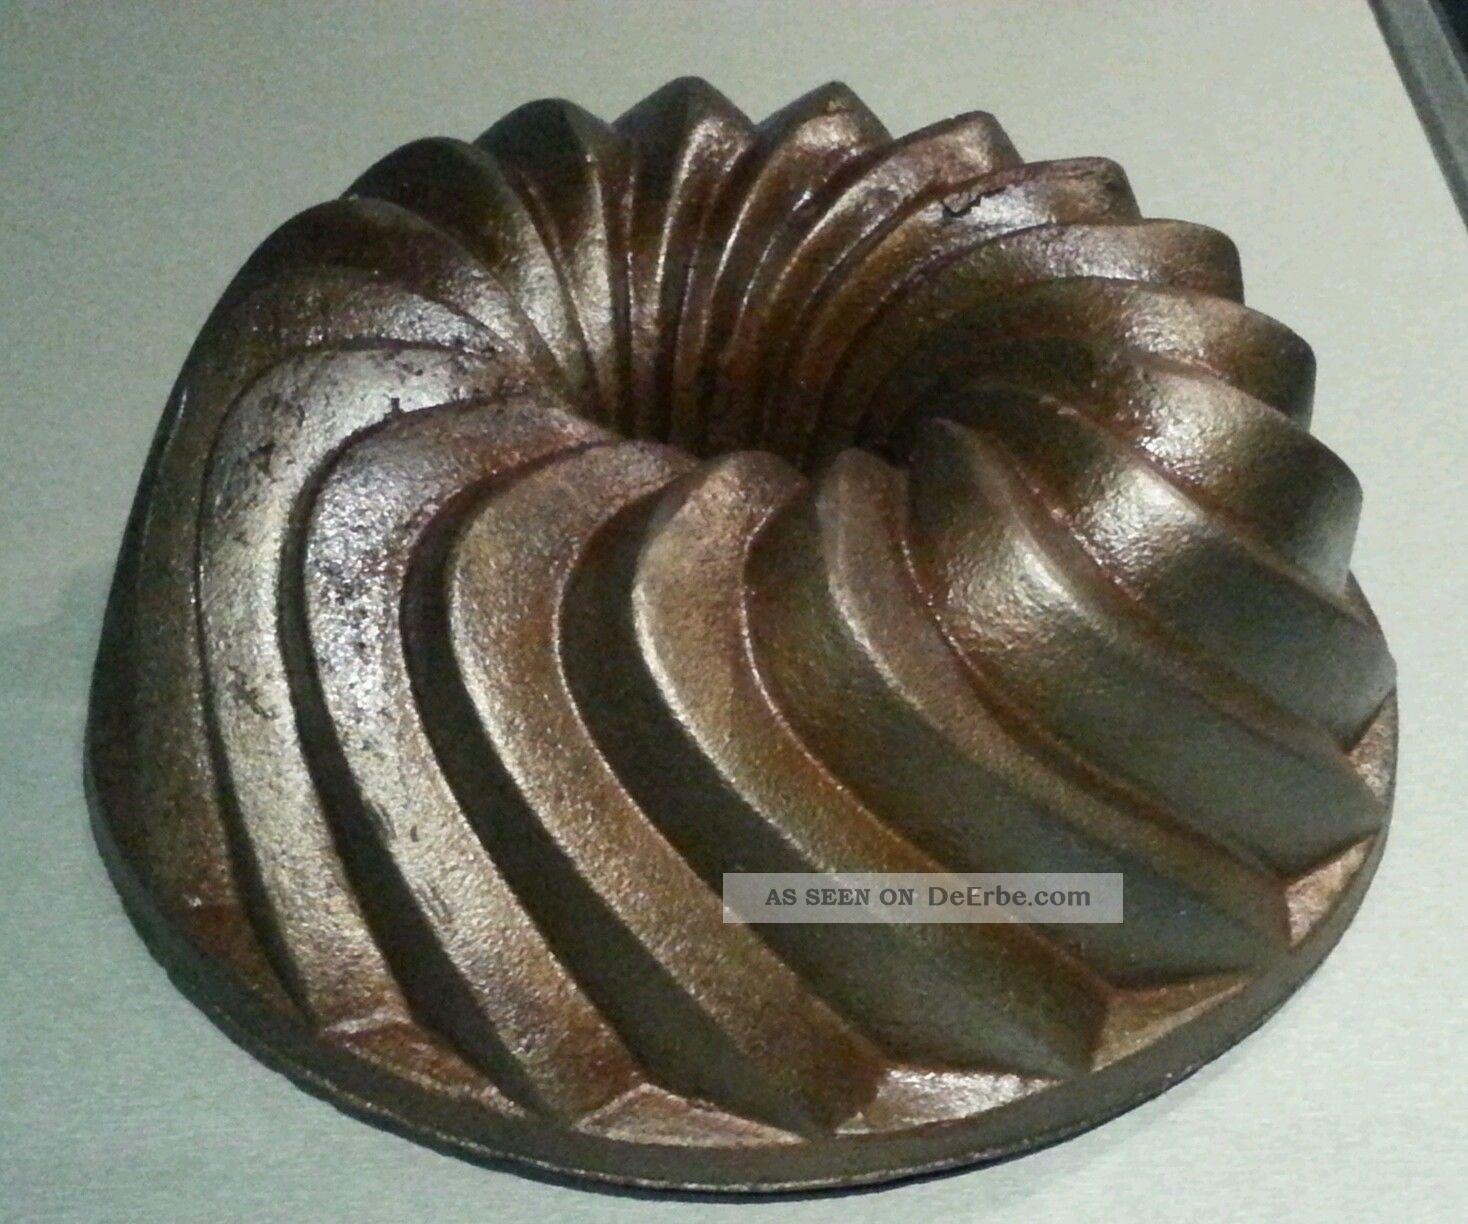 Gusseisen Alte Kuchenform Gugelhupf Backform Bundt Cake